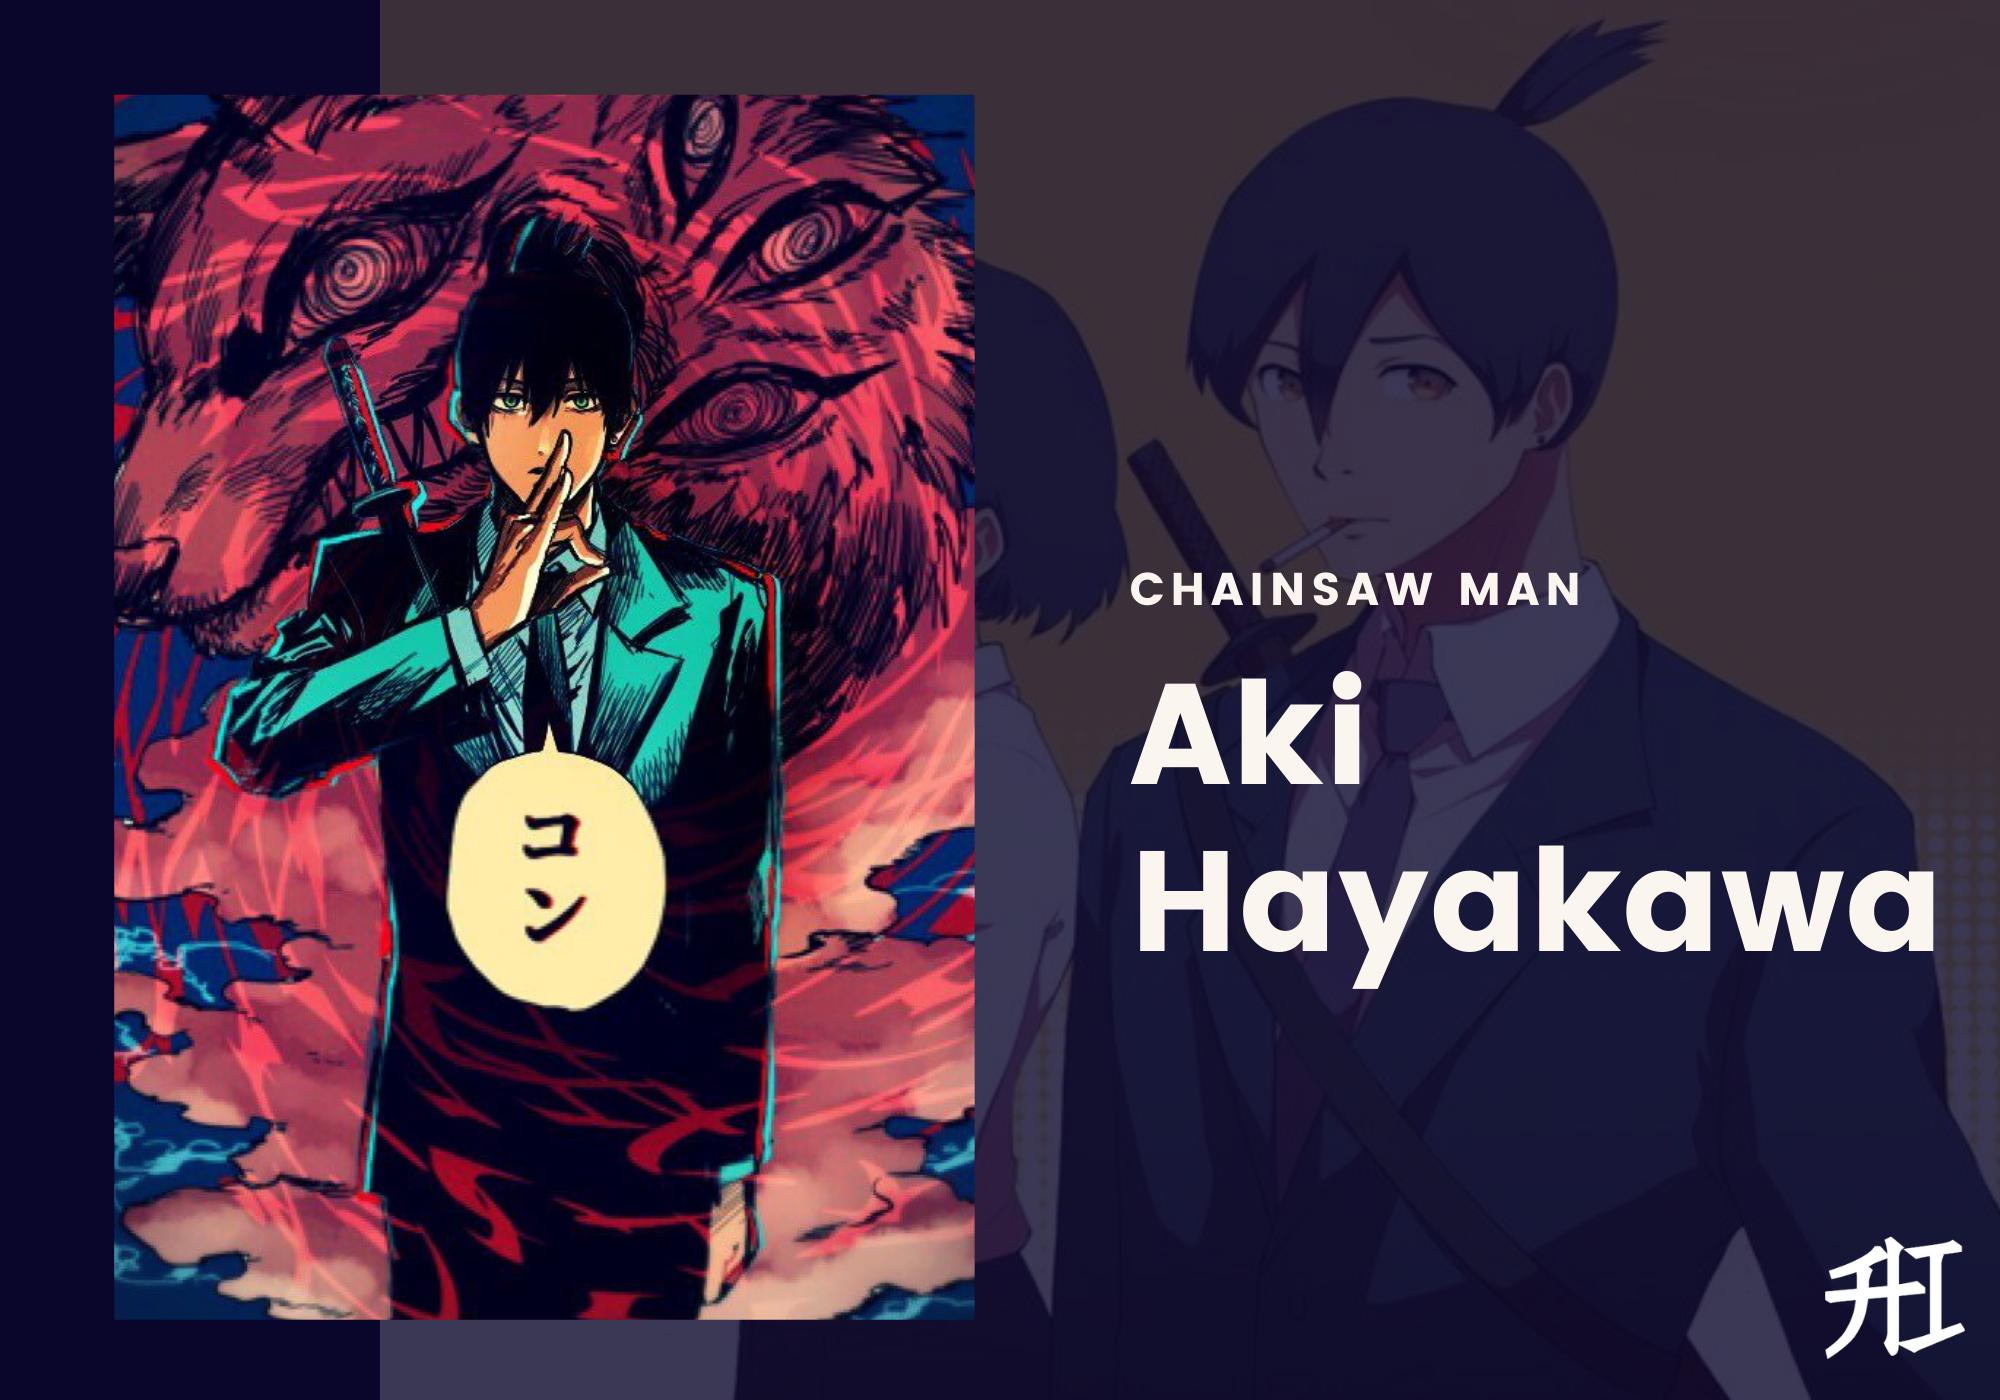 Aki Hayakawa - Strongest characters in chainsaw man